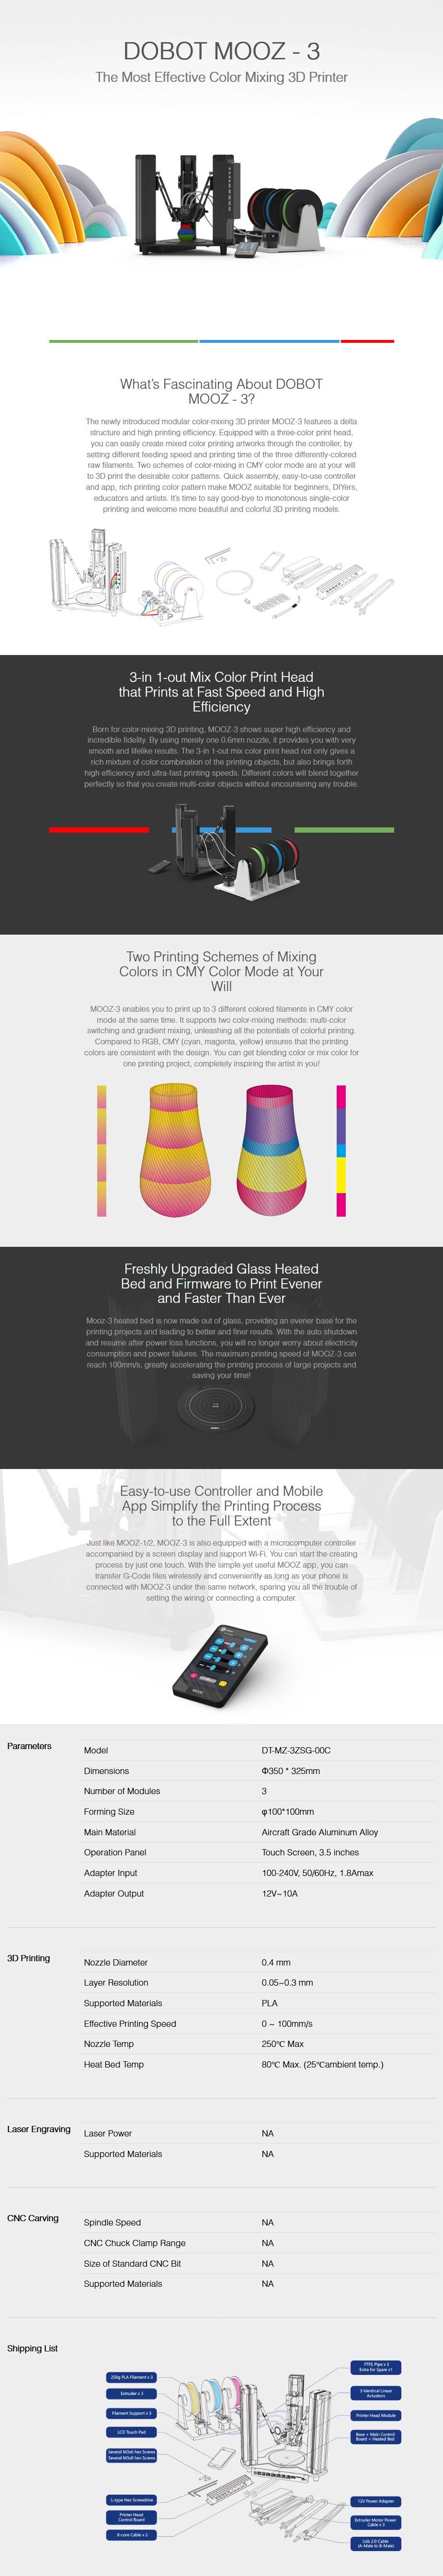 DOBOT Mooz-3z Triple Filament 3D Printer - Overview 1